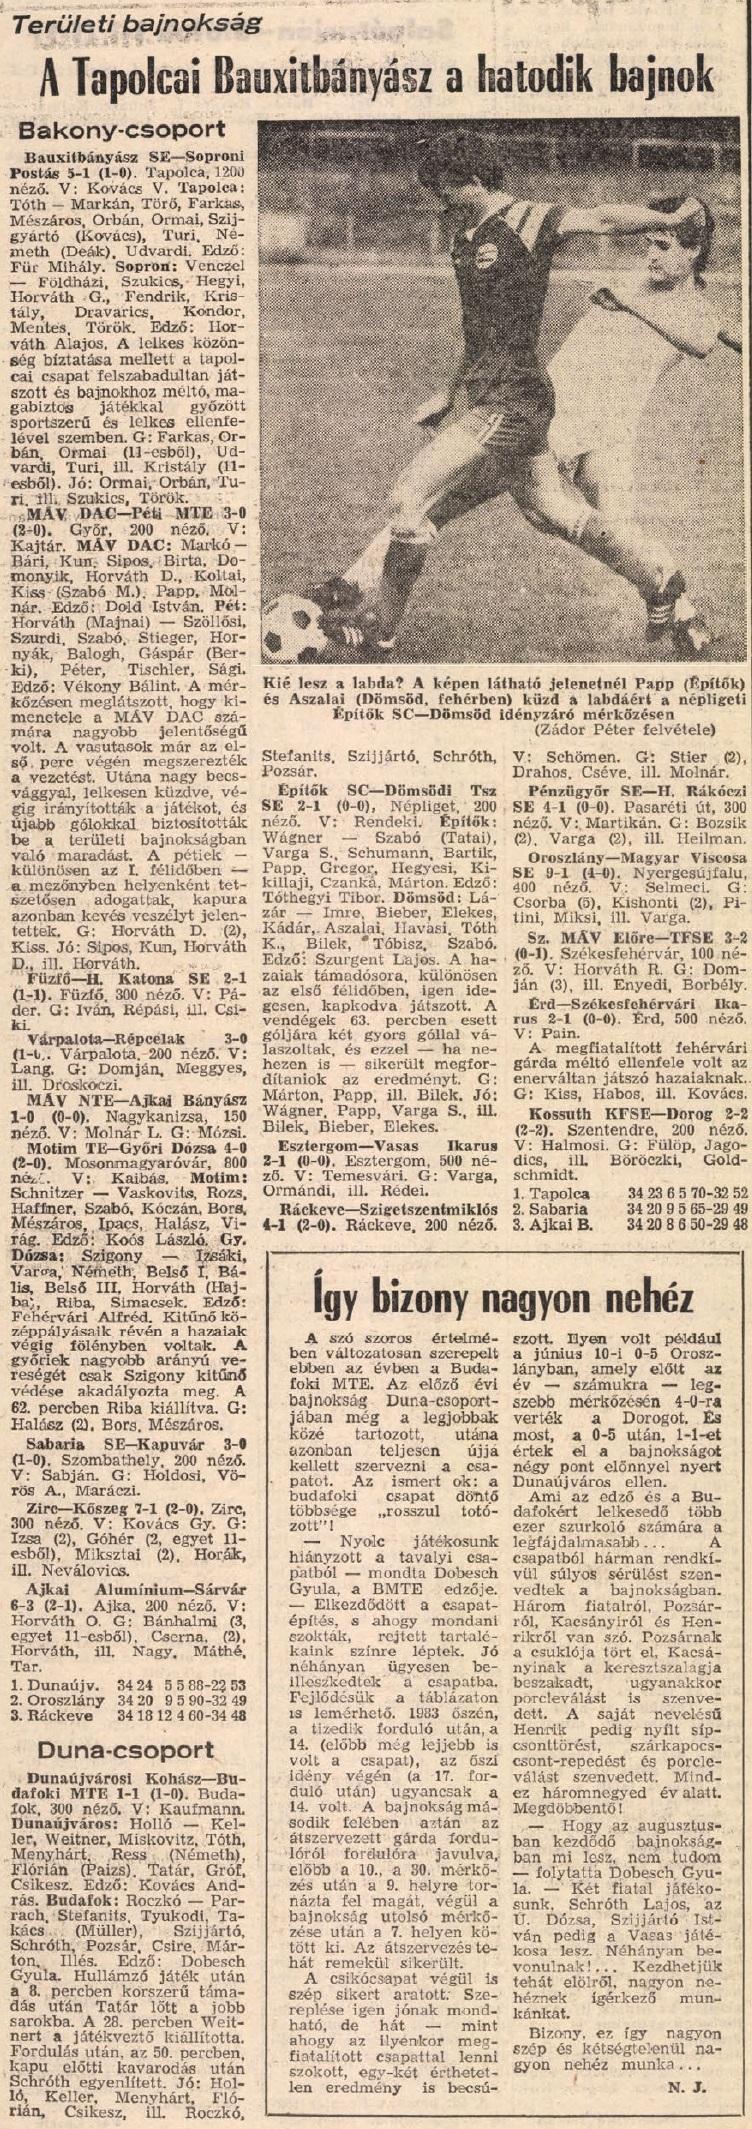 idokapszula_1984_franciaorszagi_labdarugo_europa-bajnoksag_csoportkorok_teruleti_bajnoksagok.jpg